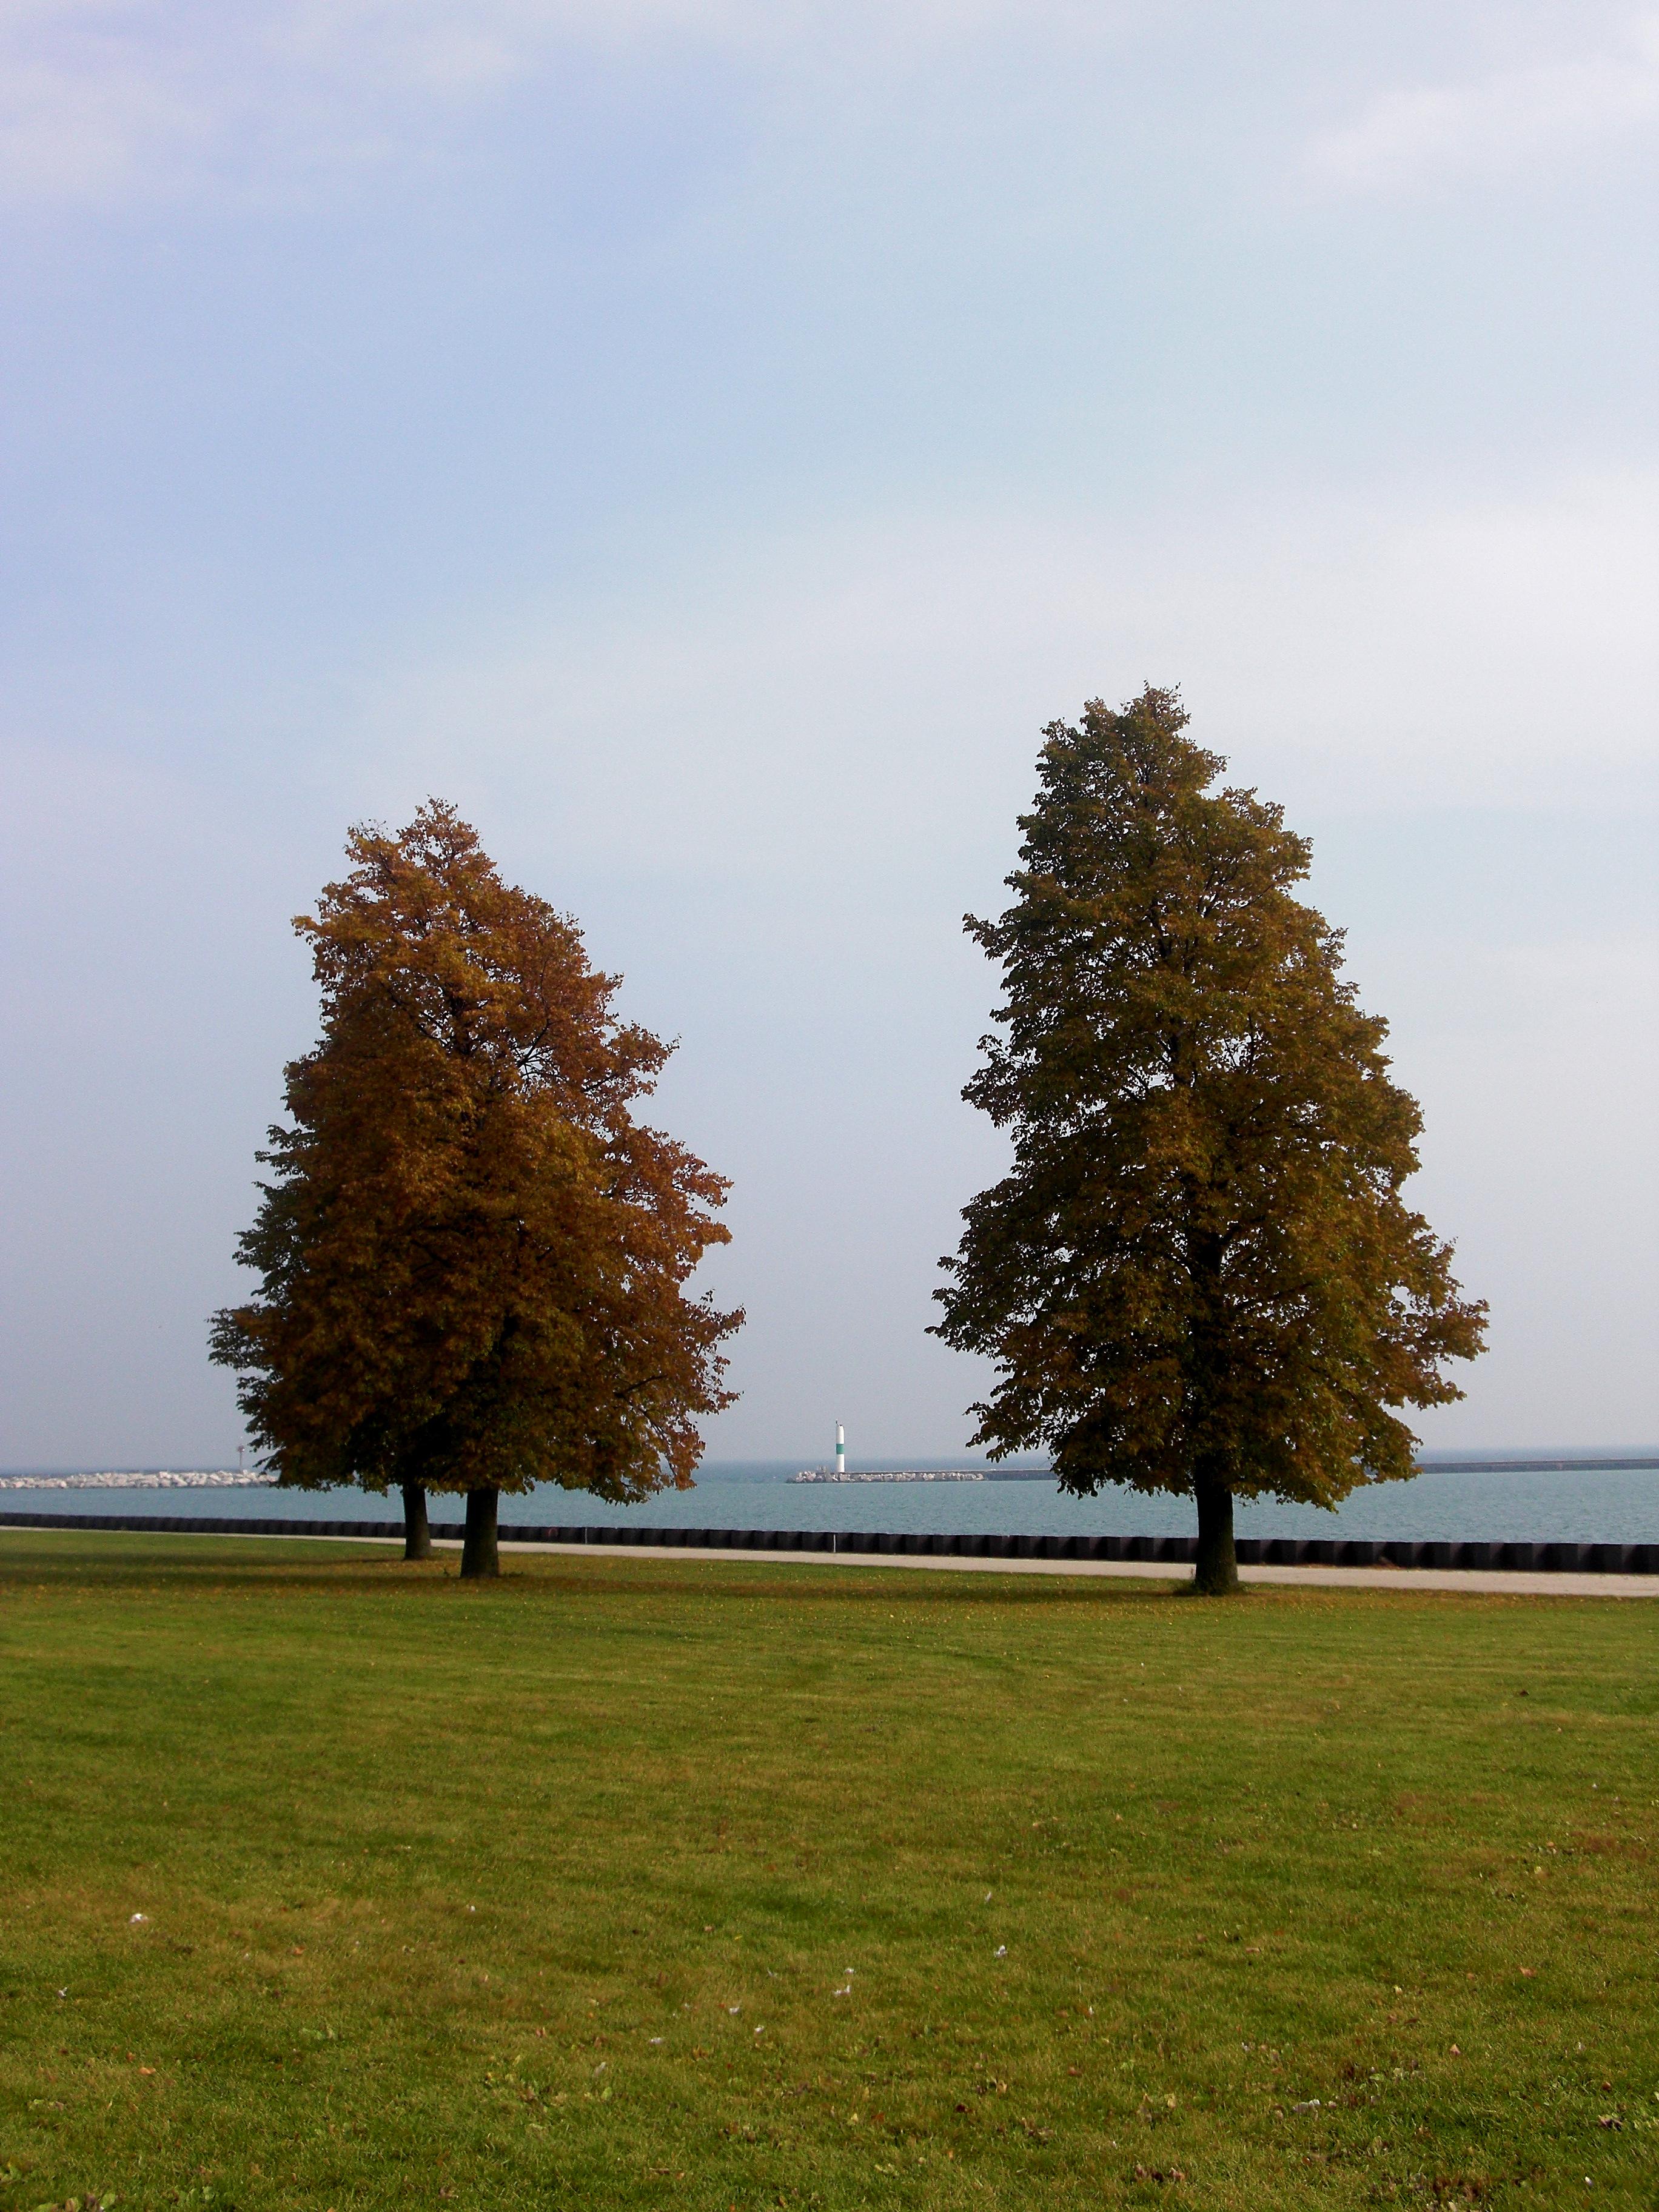 Fall, Autumn, Change, Changing, Field, HQ Photo